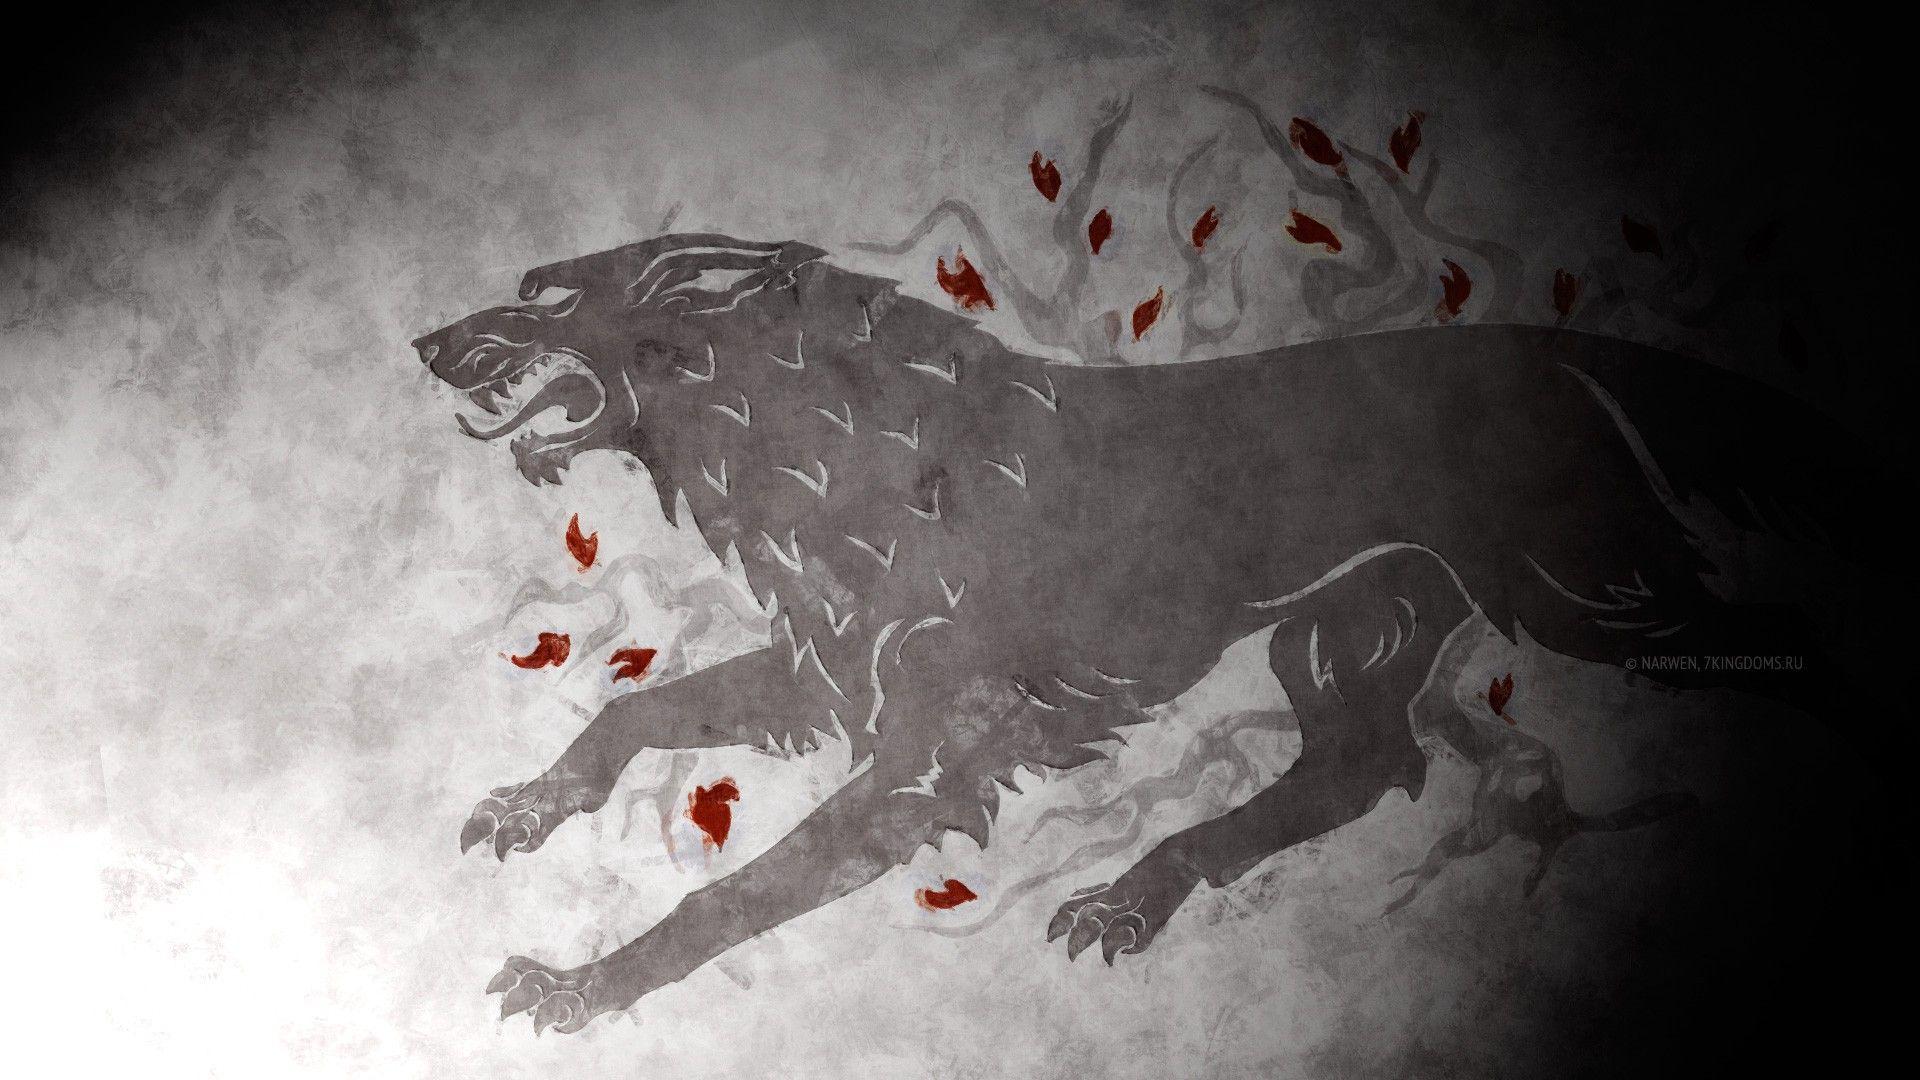 Wallpaper Martell Game Of Thrones Wallpaper Similar All Top